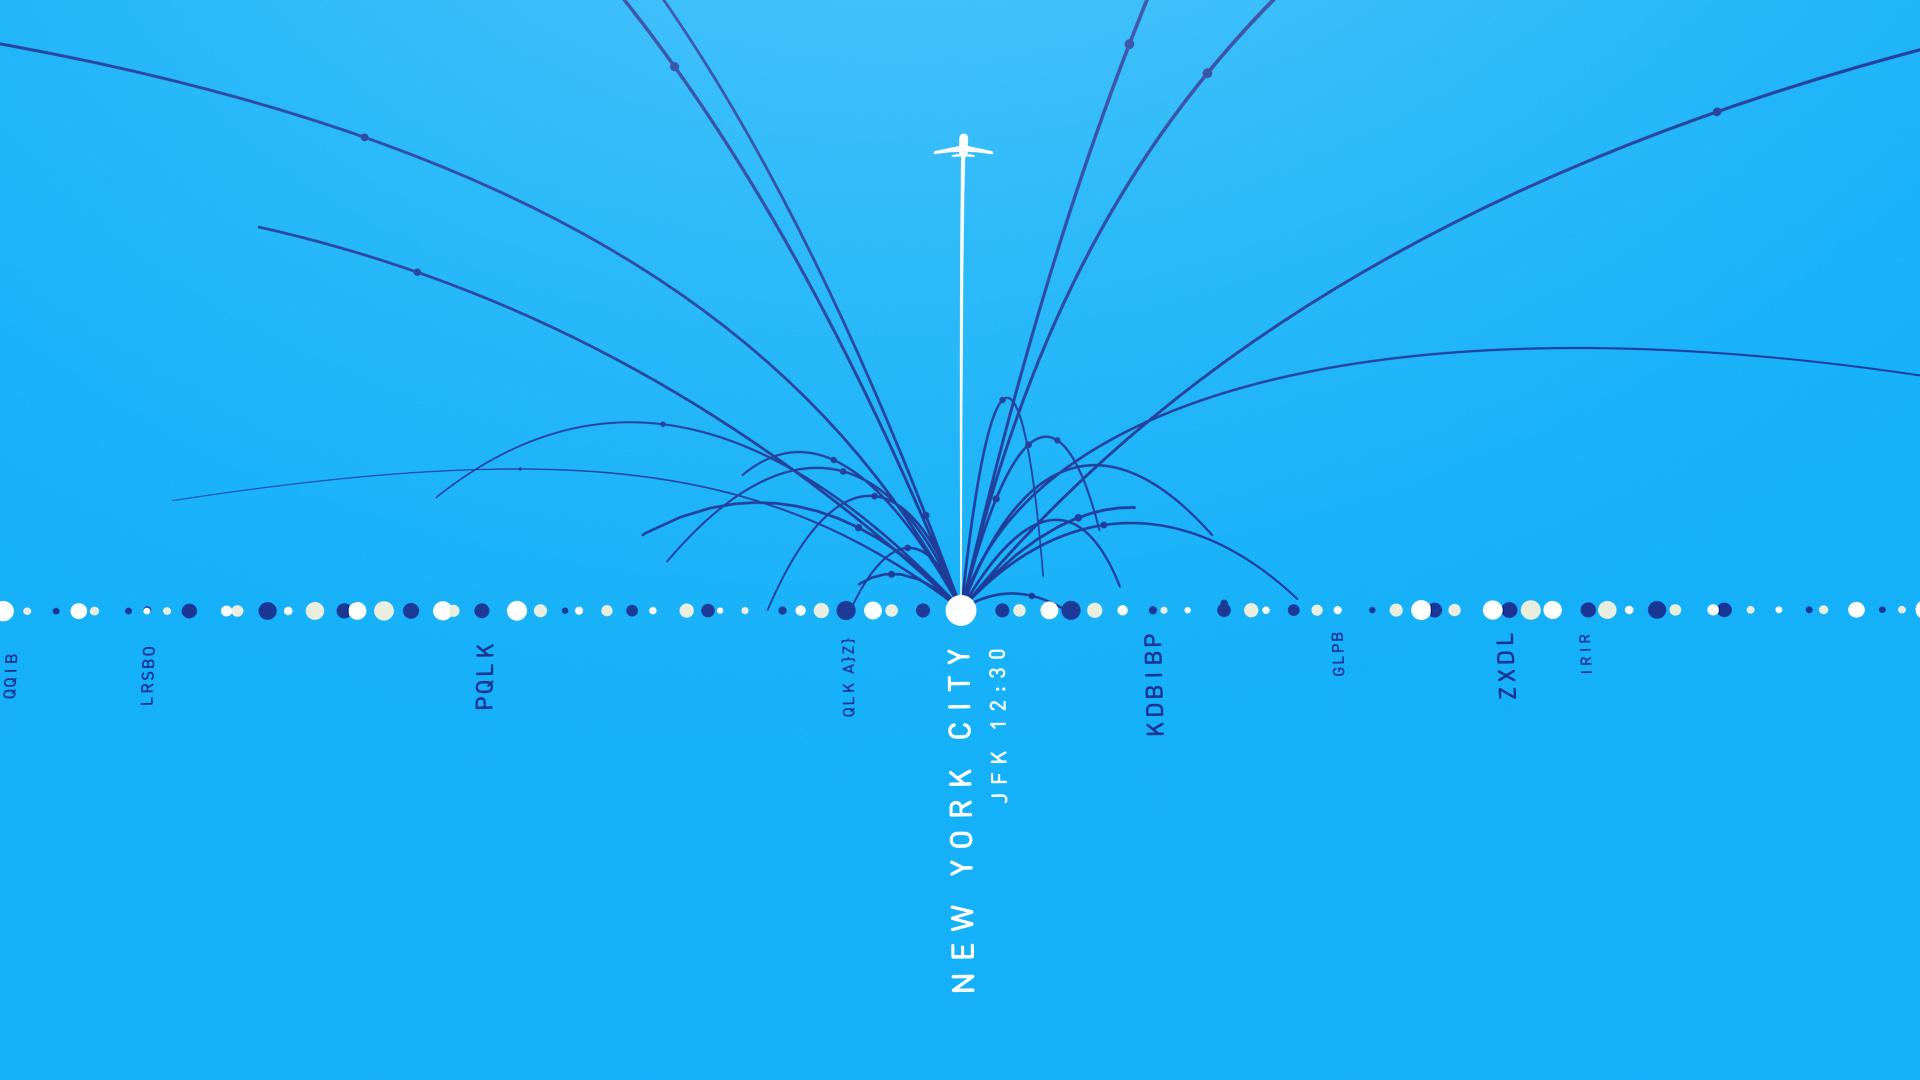 ANA_Network_30 (0;00;14;06).jpg